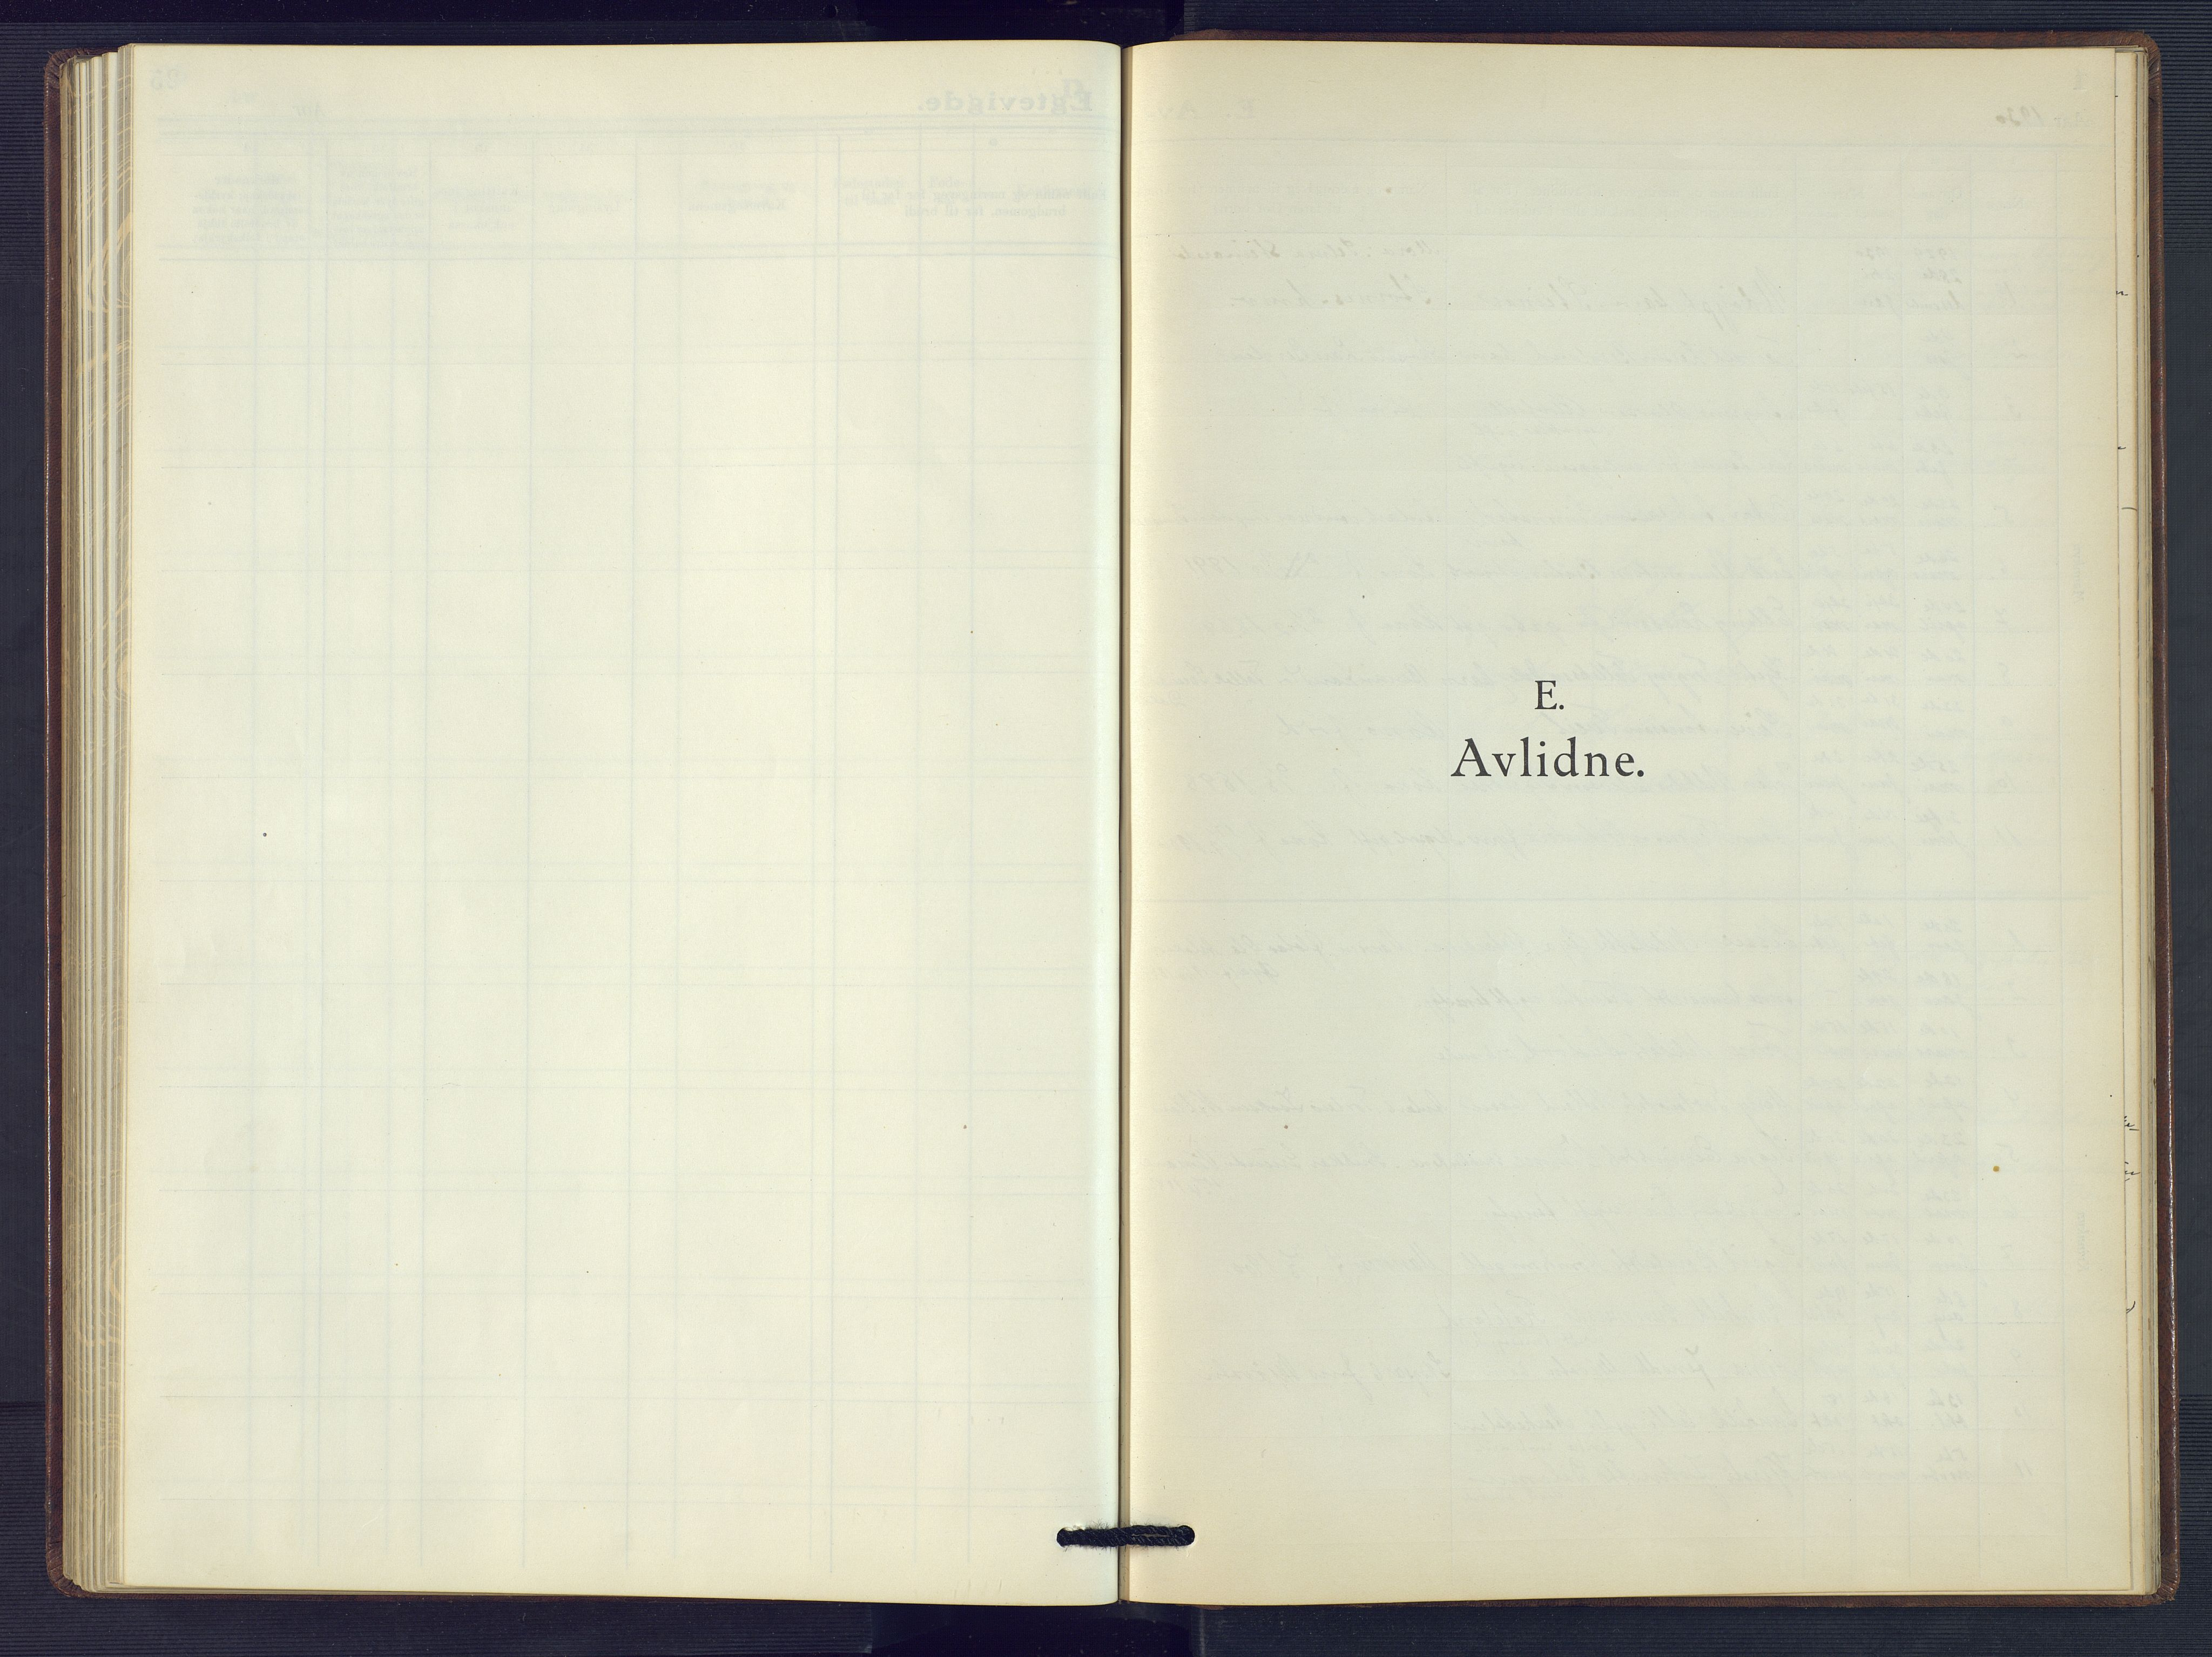 SAK, Åmli sokneprestkontor, F/Fb/Fbc/L0007: Klokkerbok nr. B 7, 1929-1960